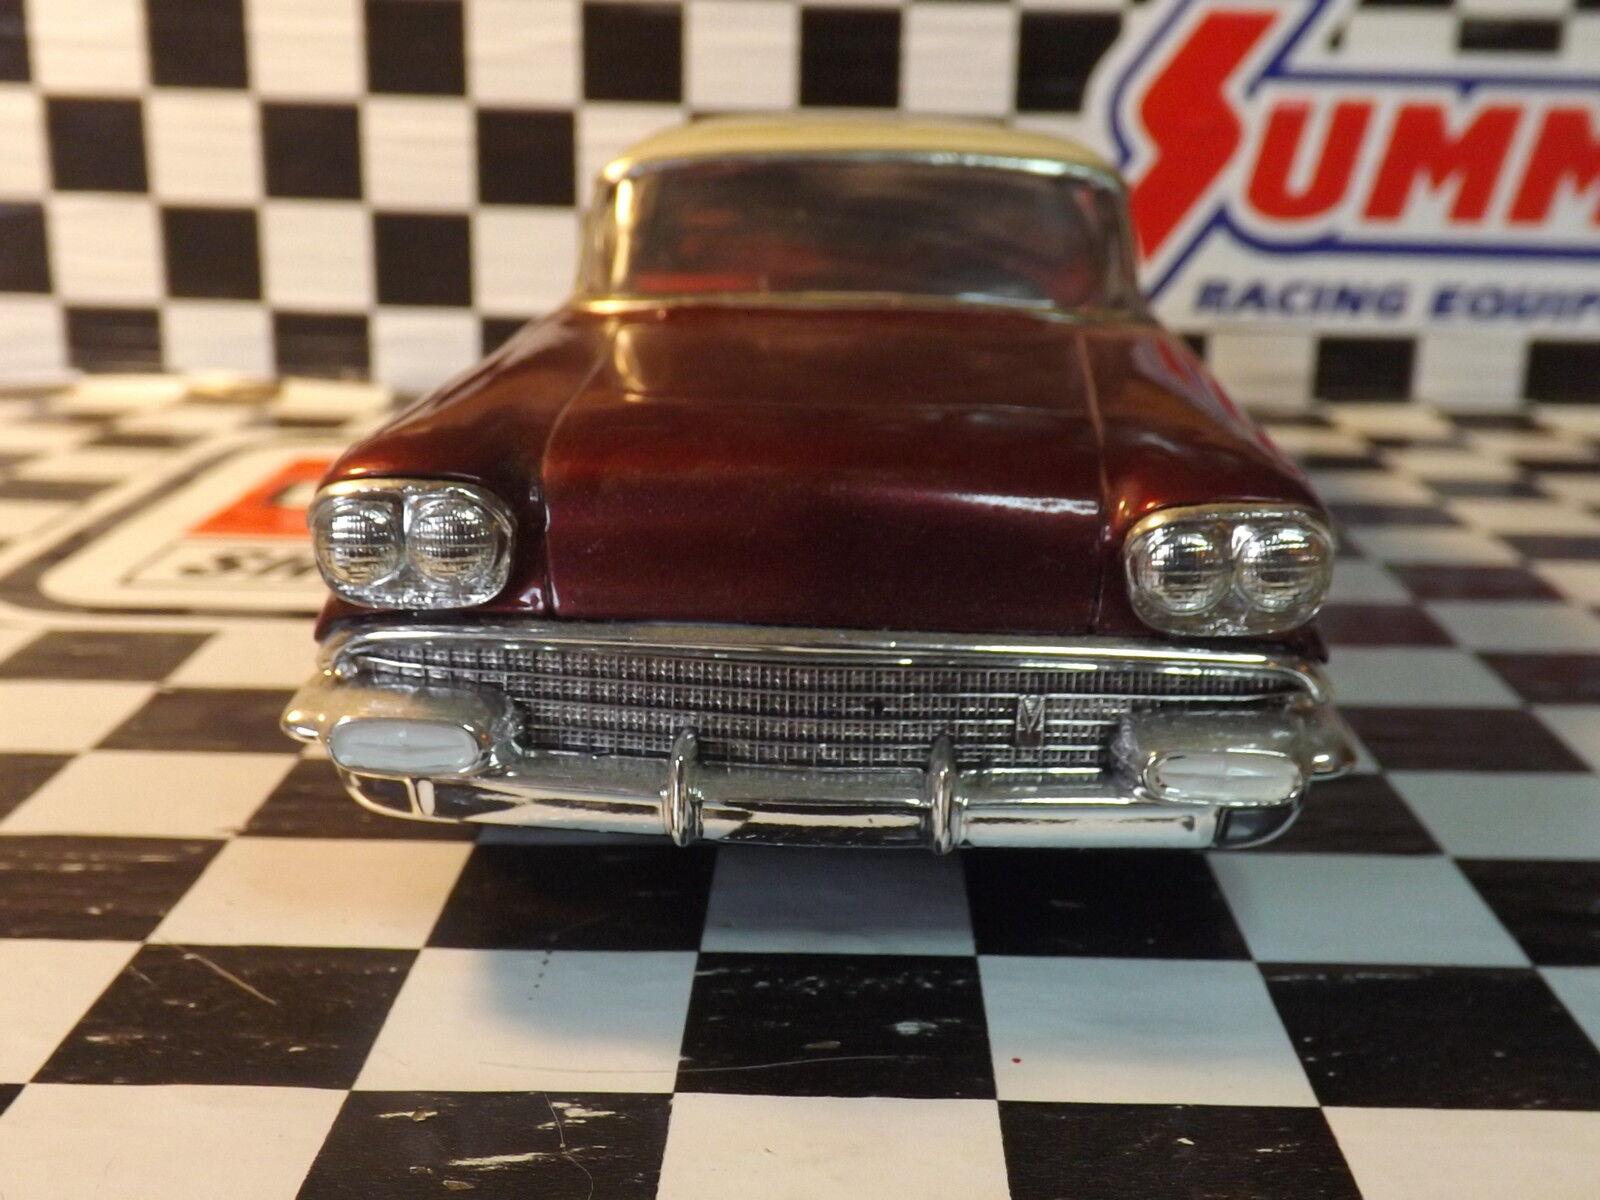 Kimberlyscloset_modelcars